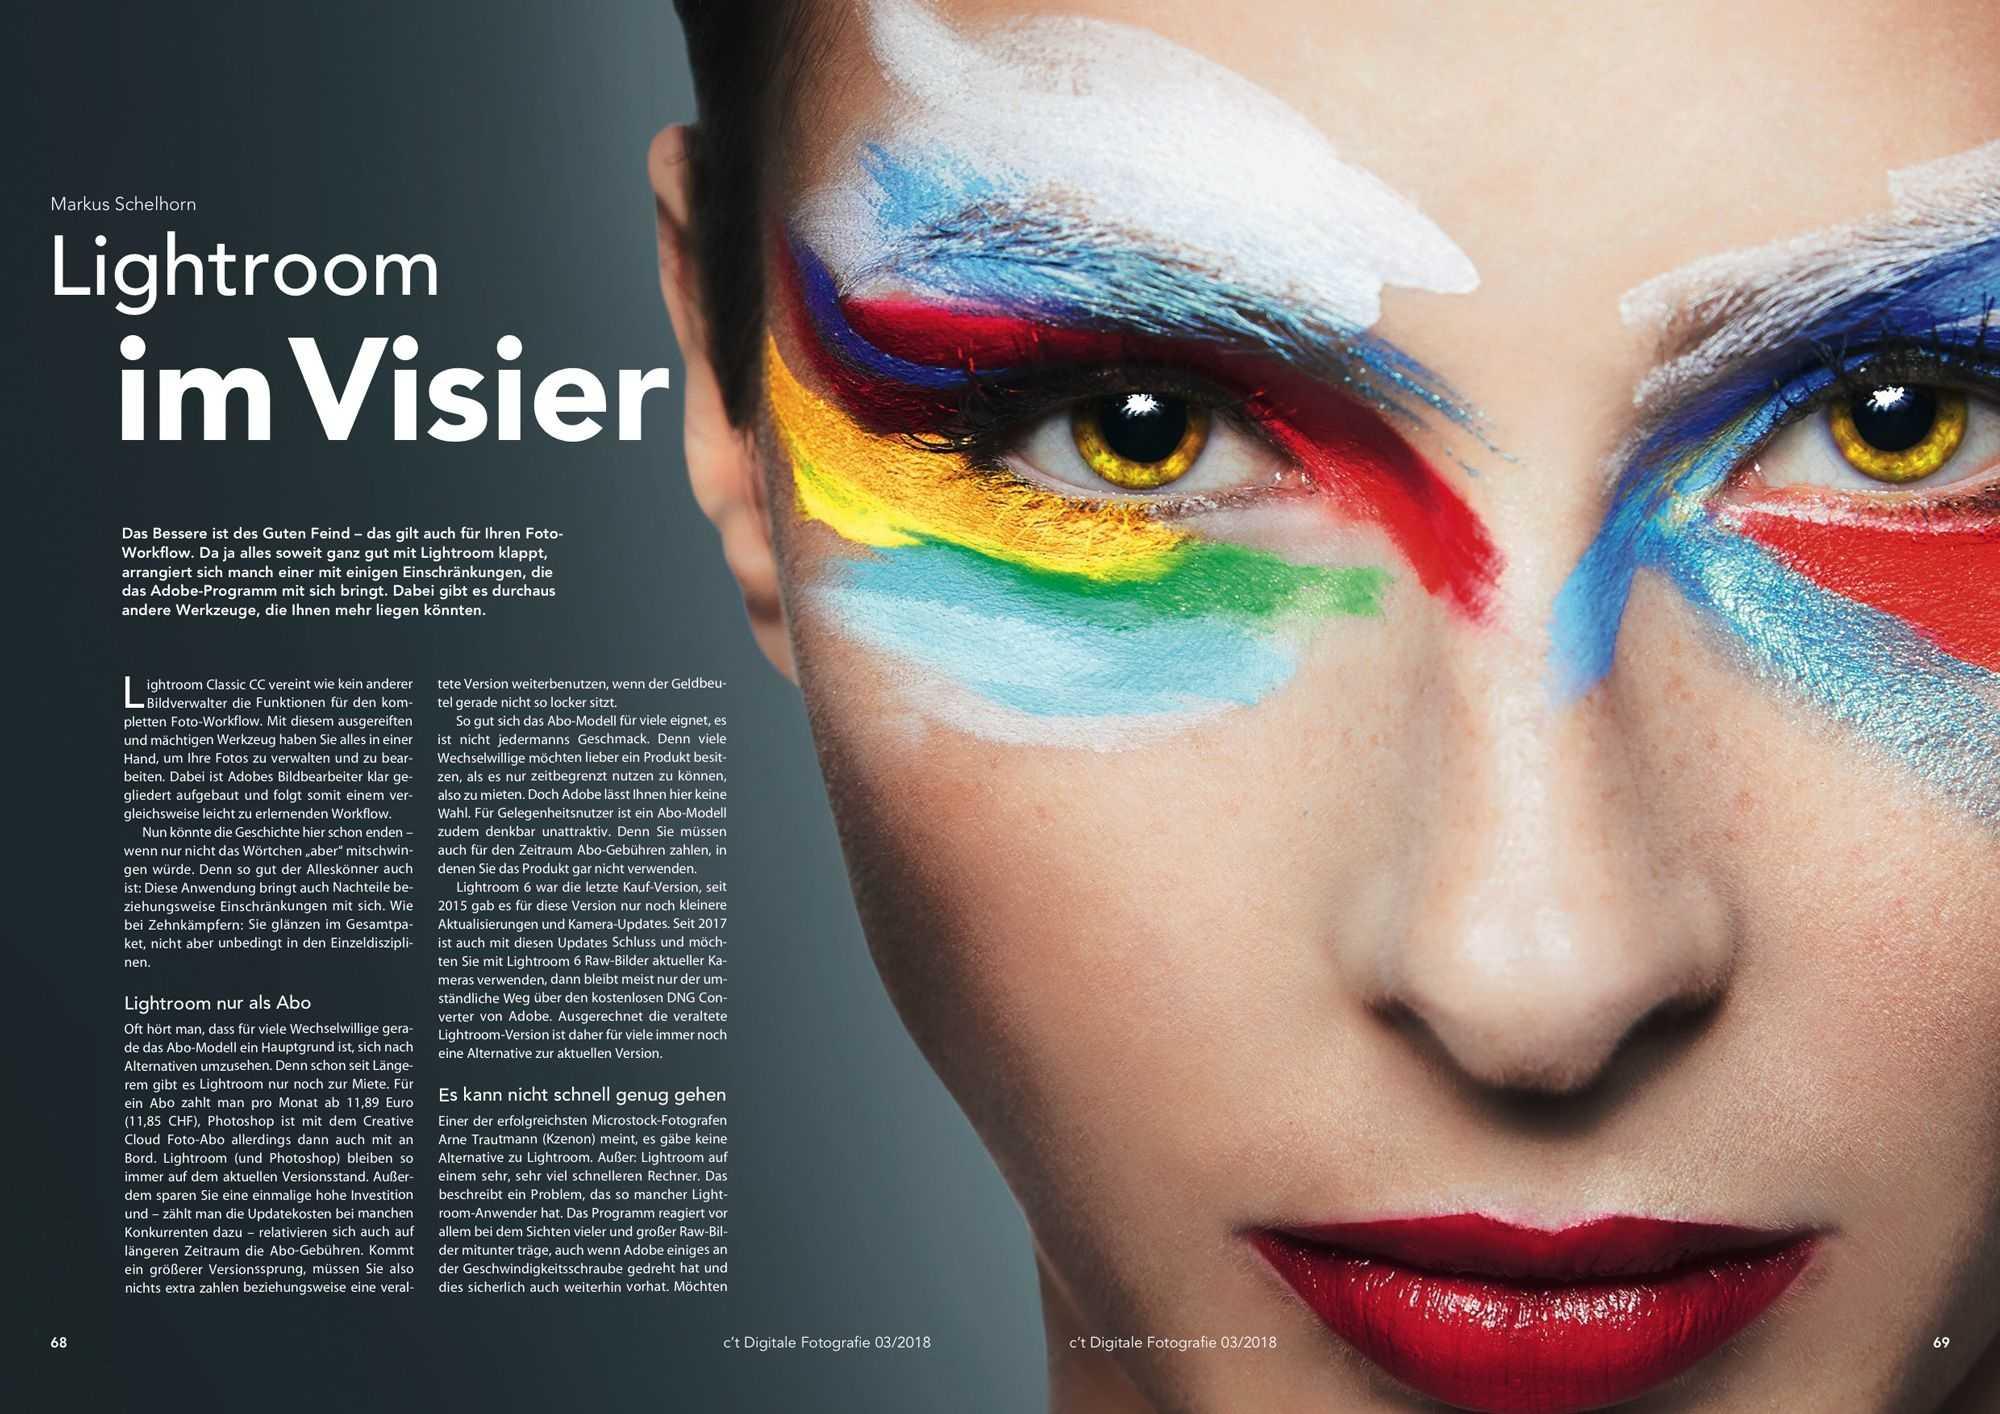 Lightroom im Visier, c't Fotografie 3/2018